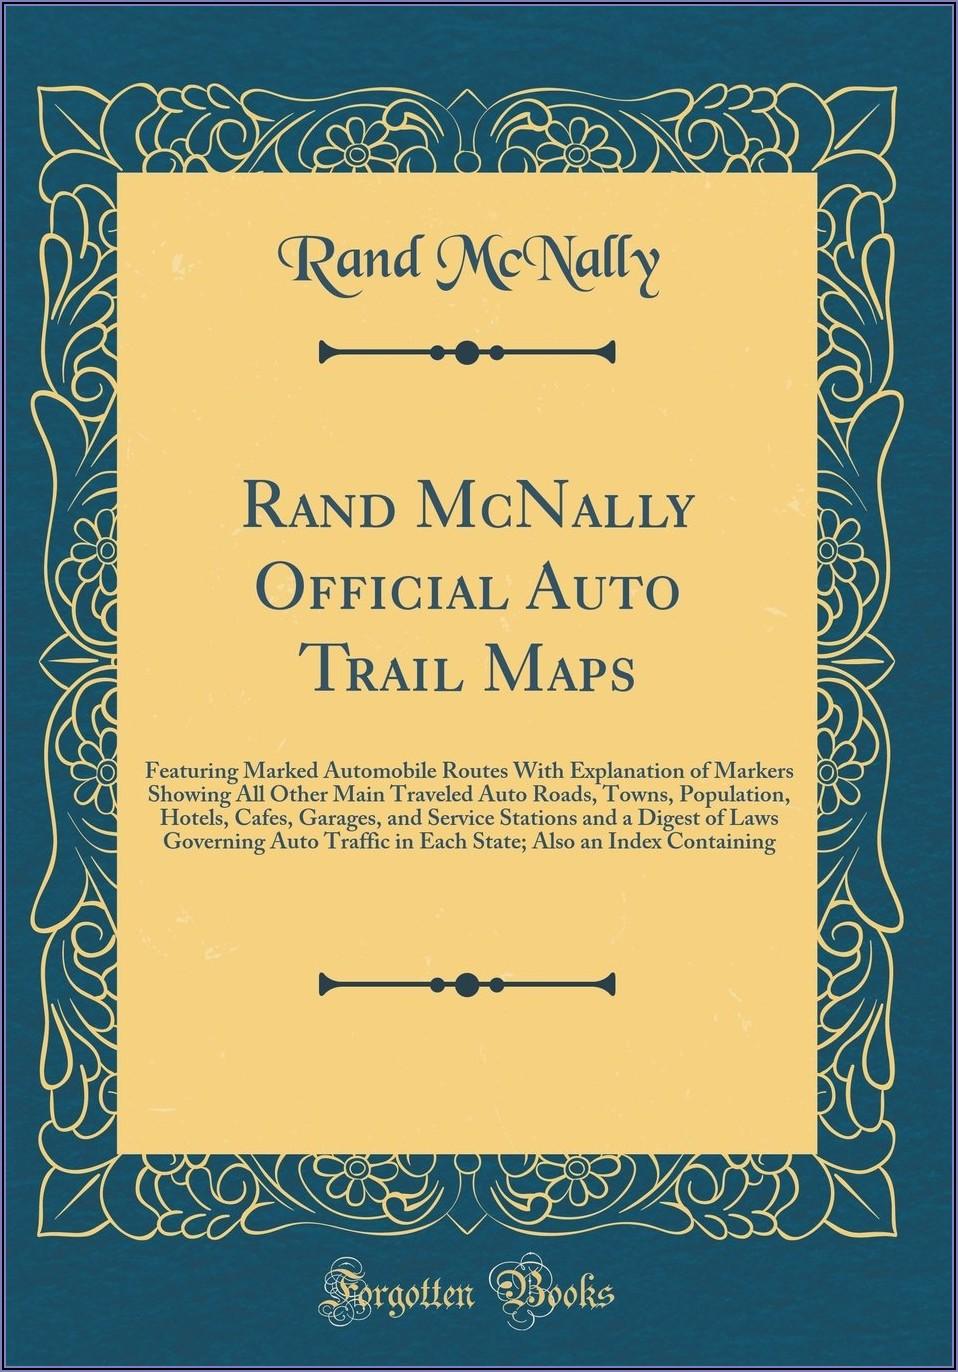 Where Can I Buy Rand Mcnally Maps